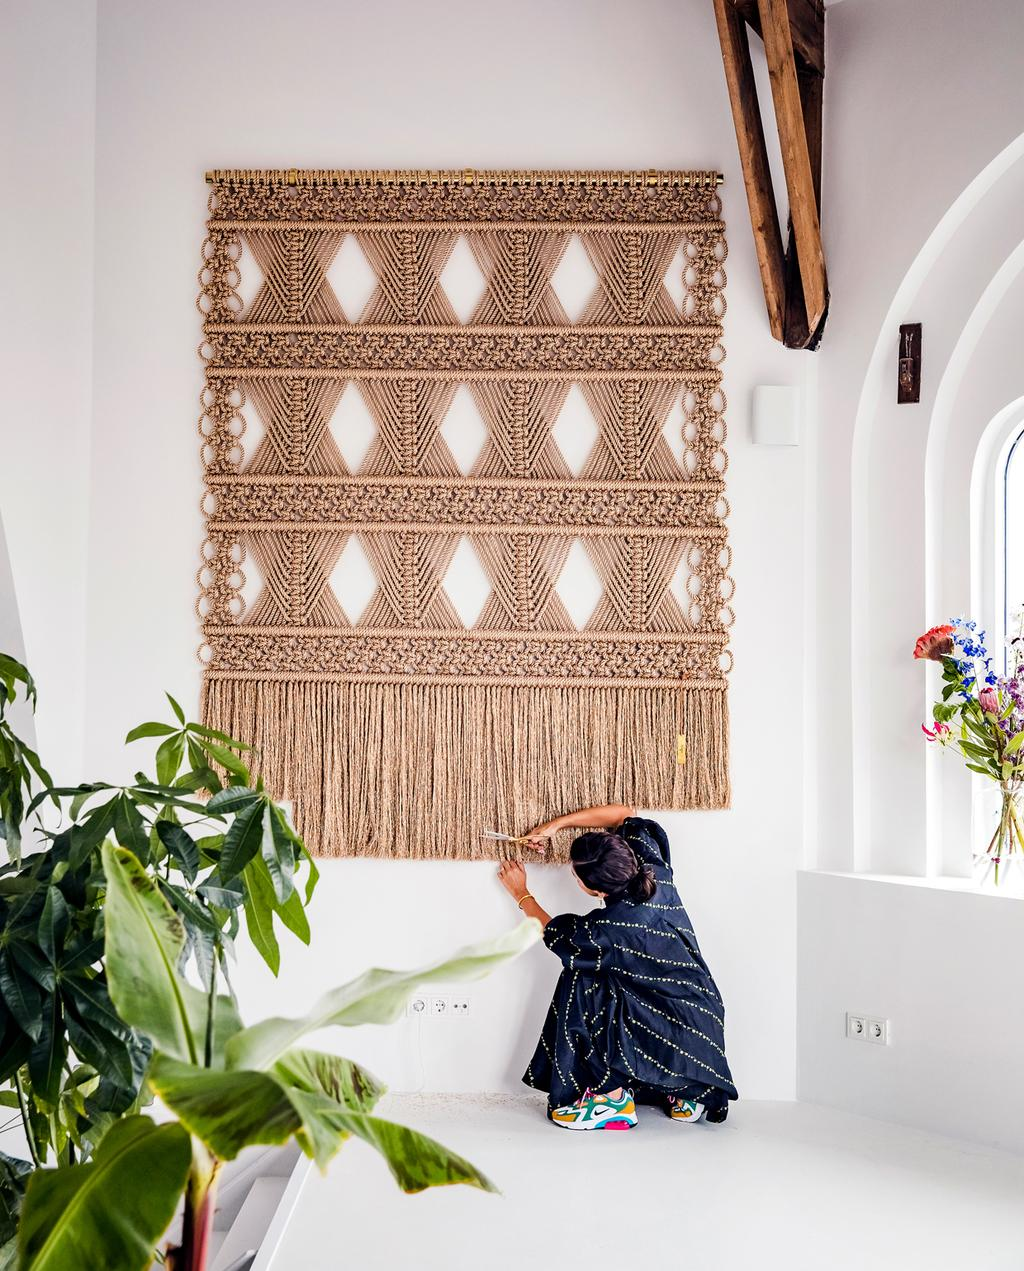 vtwonen 13-2019 | Ambacht Milla wandkleed beige | Ambacht hand geknoopte wandkleden